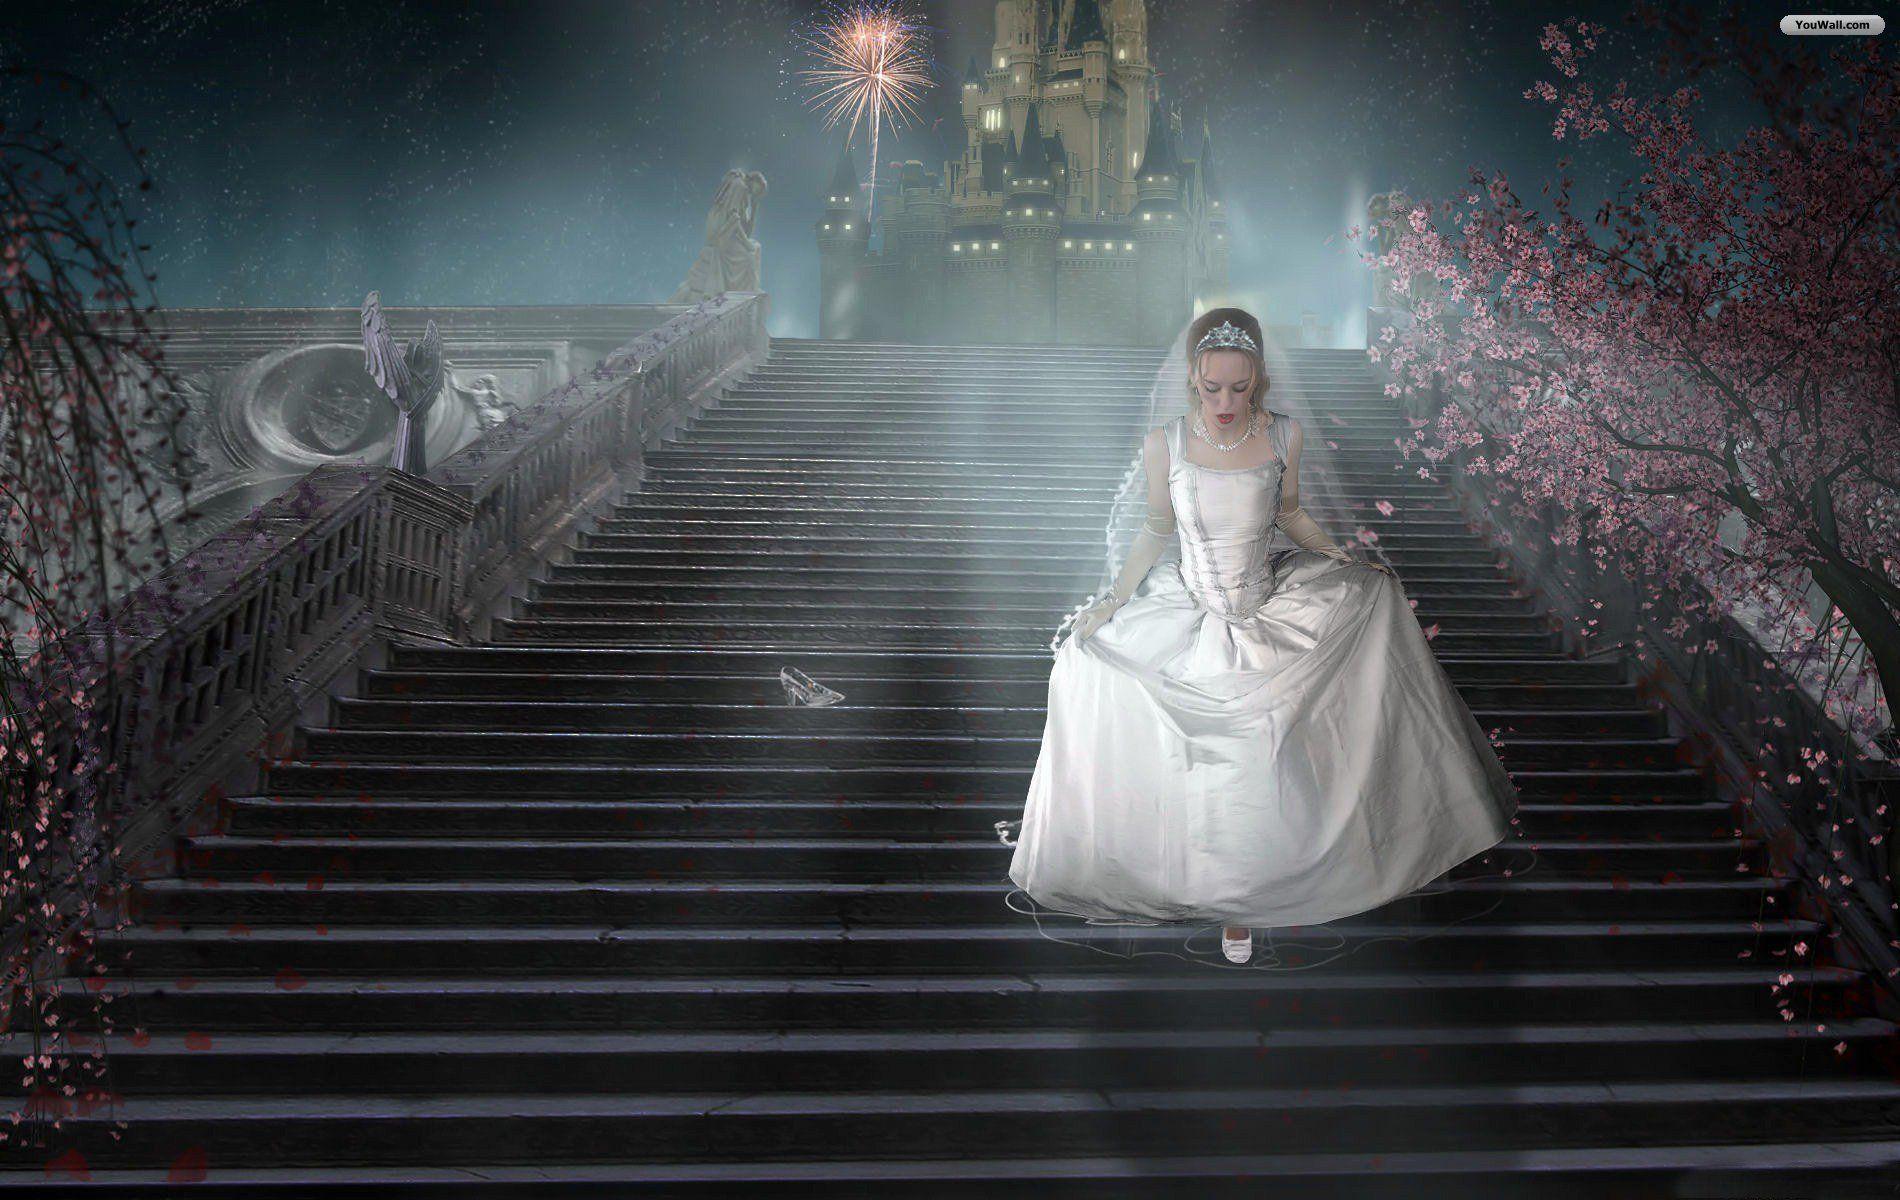 Disney princess cinderella hd wallpaper for tablet cartoons 1280800 disney princess cinderella hd wallpaper for tablet cartoons 1280800 pics of cinderella wallpapers thecheapjerseys Gallery